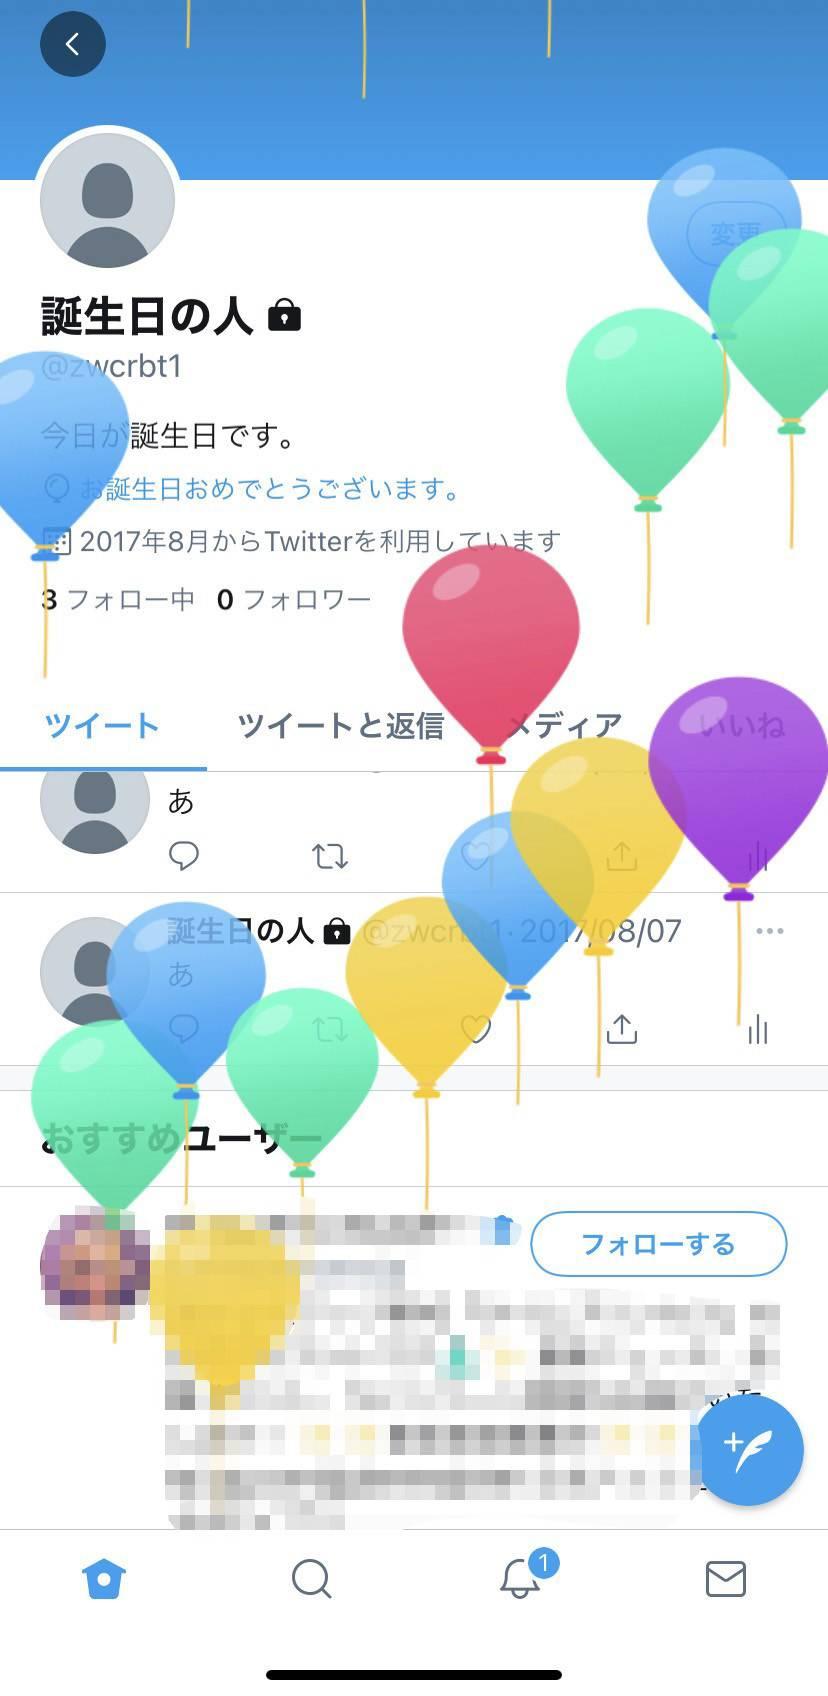 Twitter誕生日:風船が飛ぶ